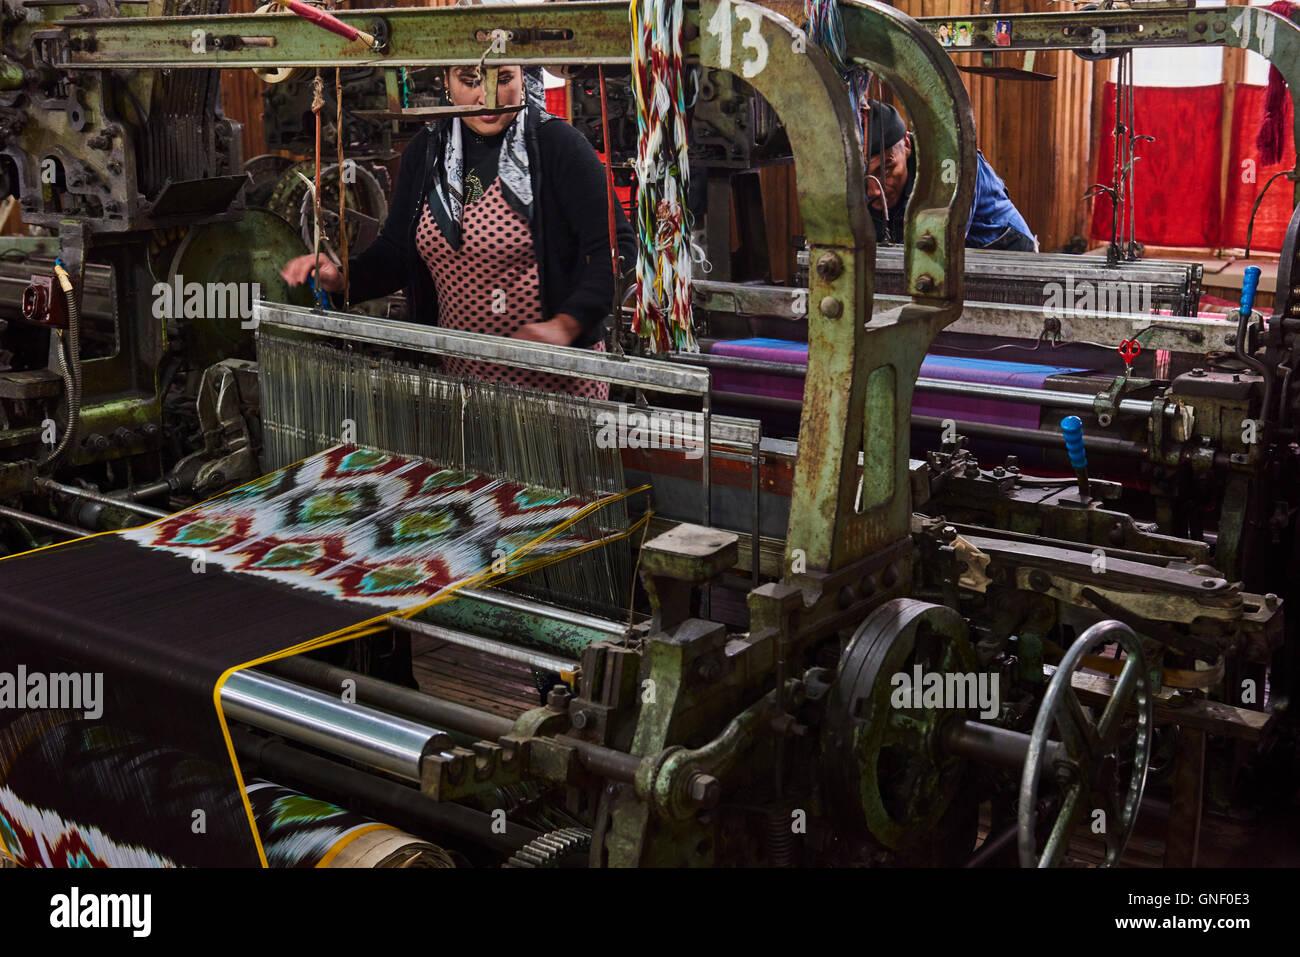 Uzbekistan, Fergana region, Marguilan, bazaar, silk weaving  factory - Stock Image